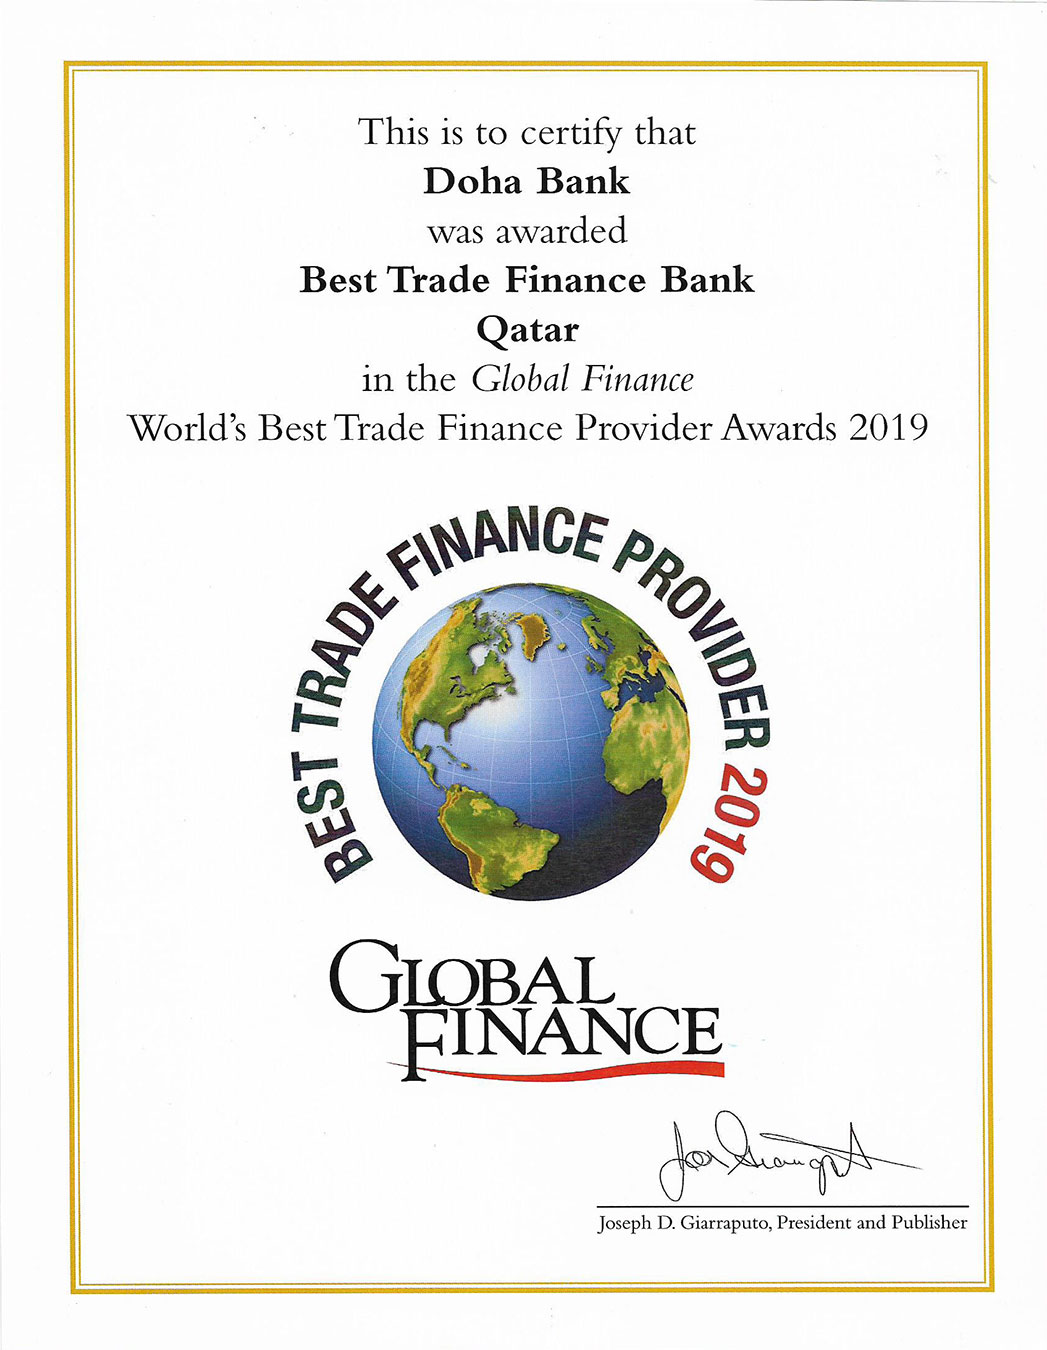 Best Trade Finance Bank